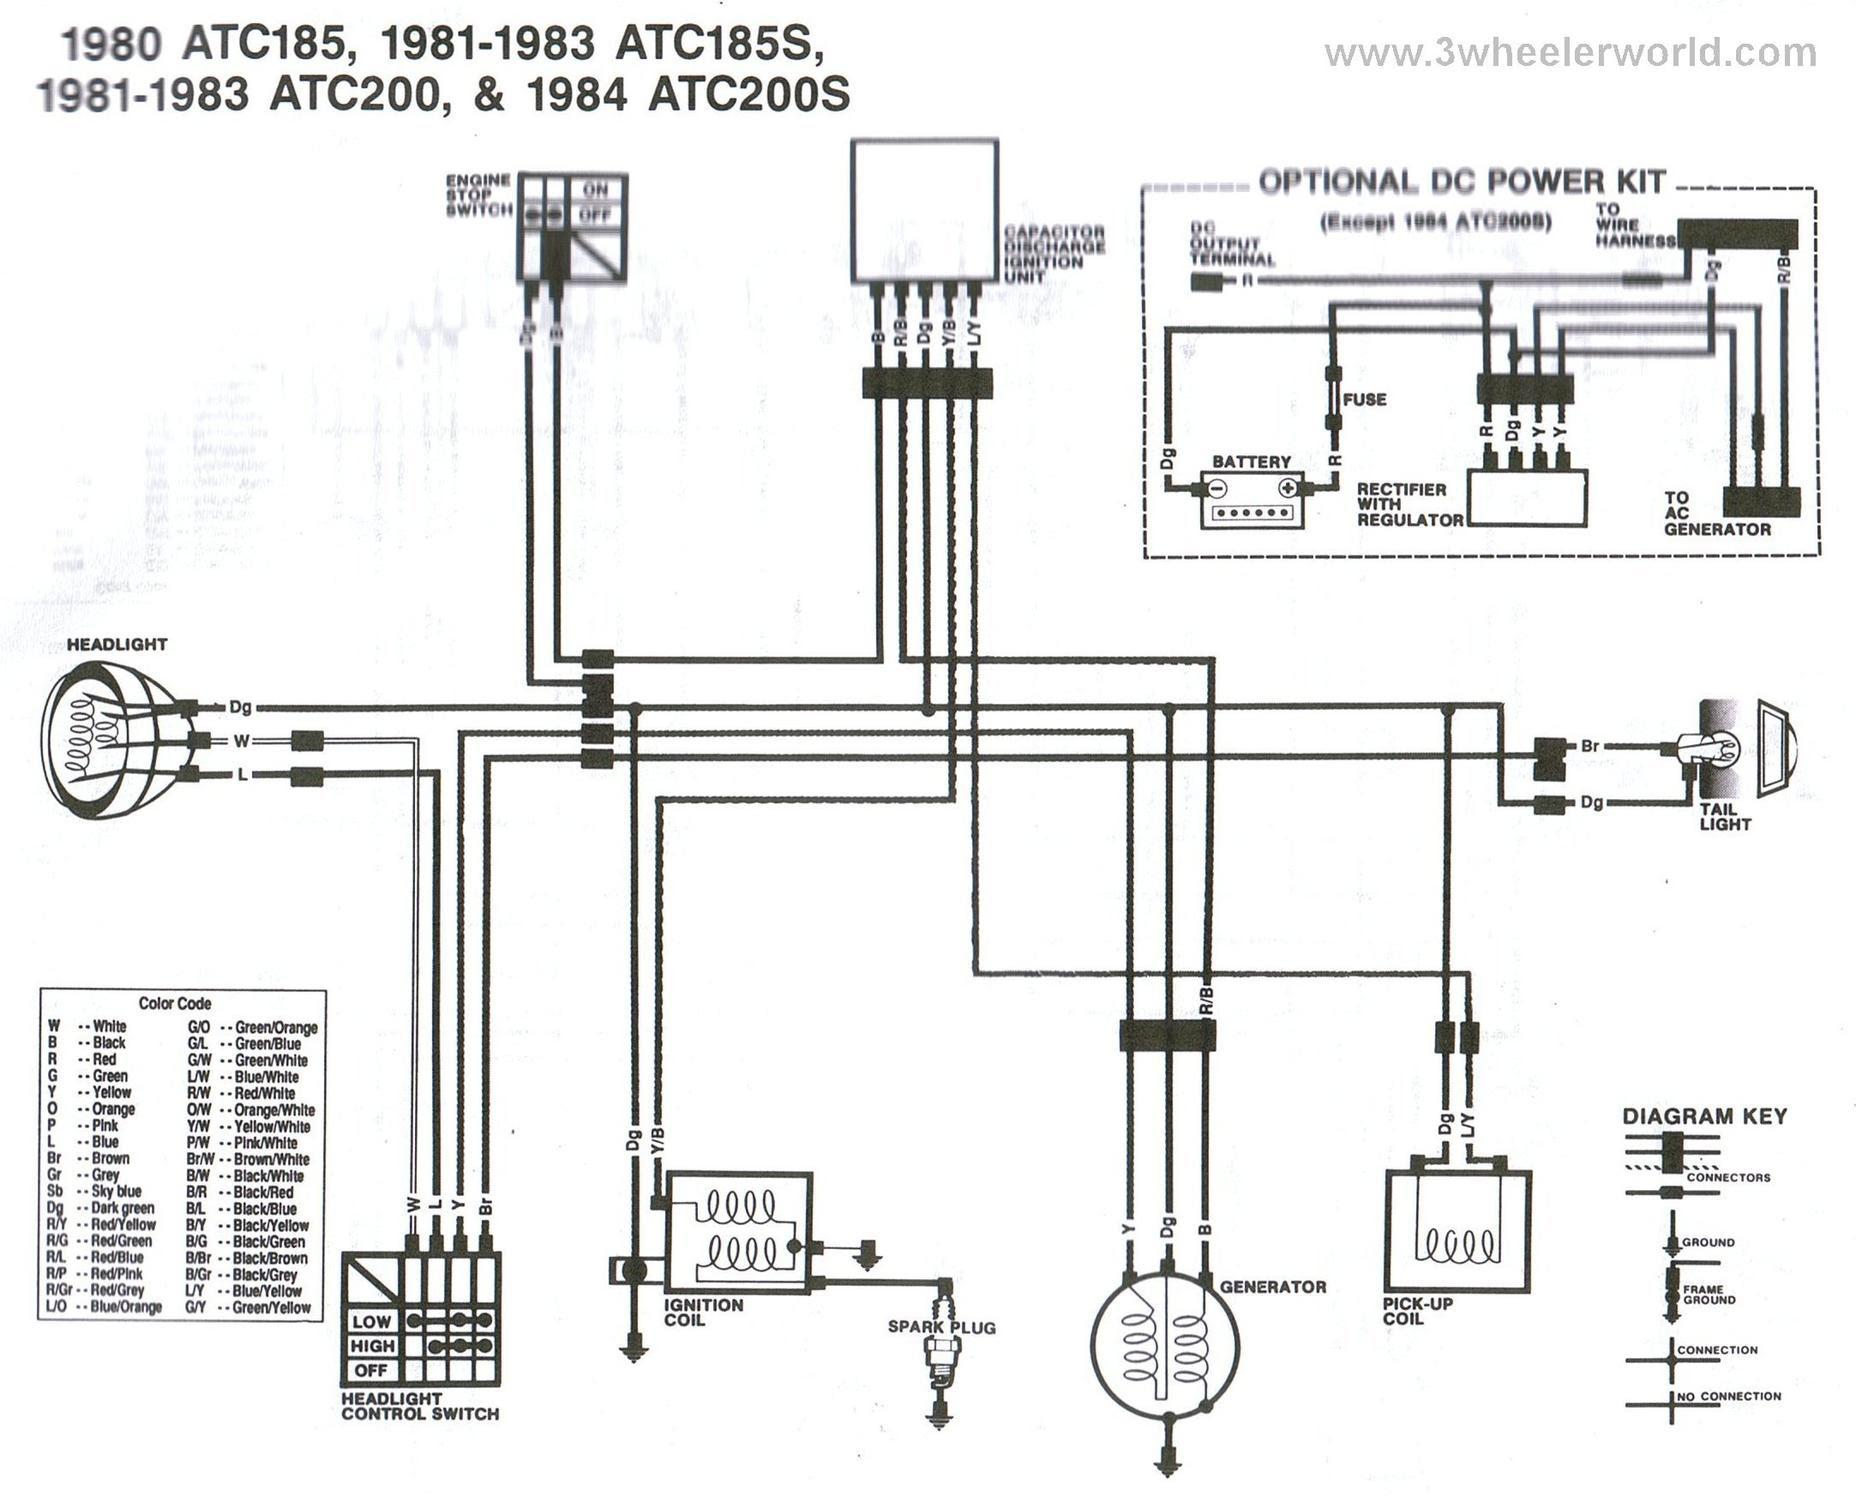 1988 Honda 200 Wiring Diagram 2002 Zx6 Fuse Box Bullet Squier Nescafe Cappu Jeanjaures37 Fr